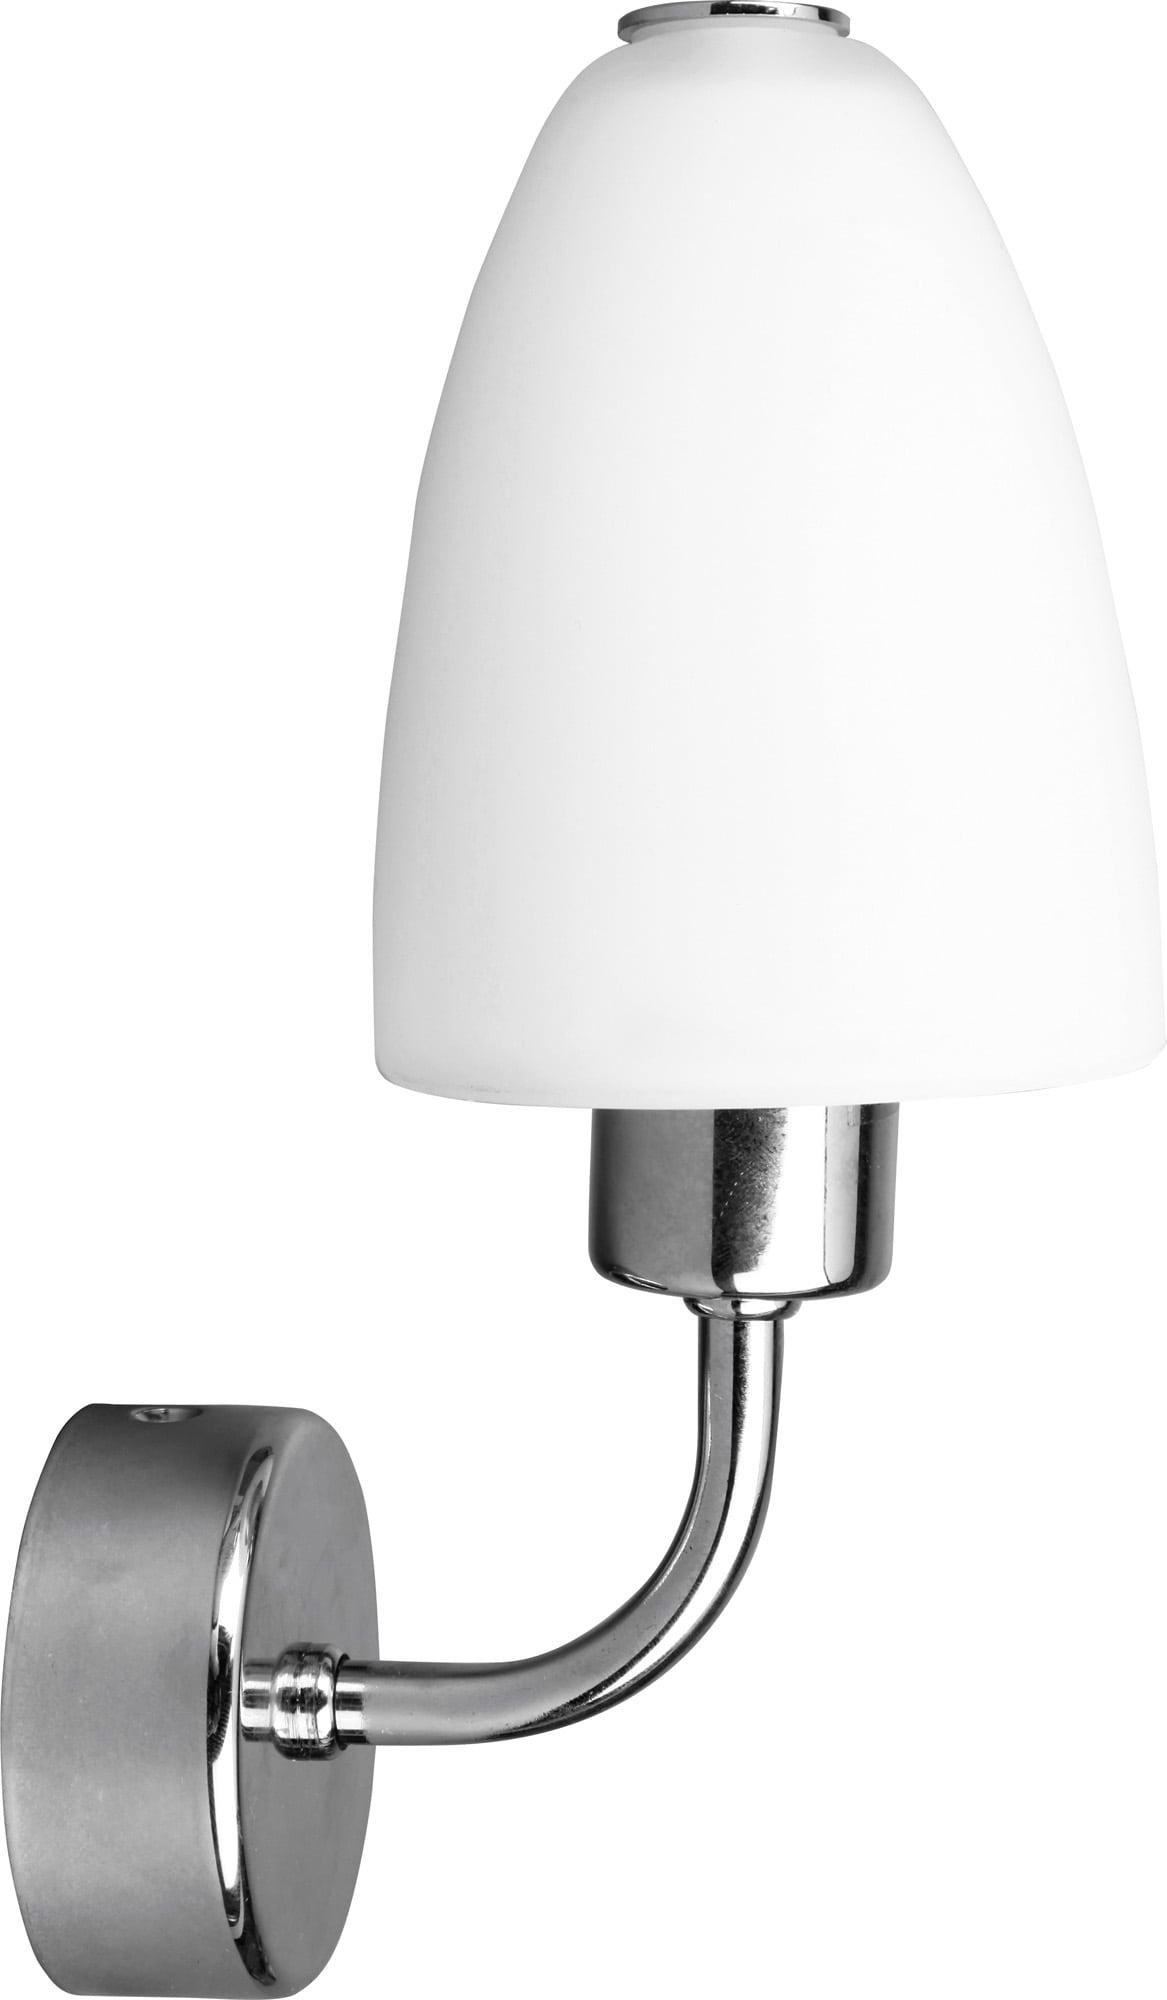 Stylish wall lamp Aquatic chrome / white E14 40W